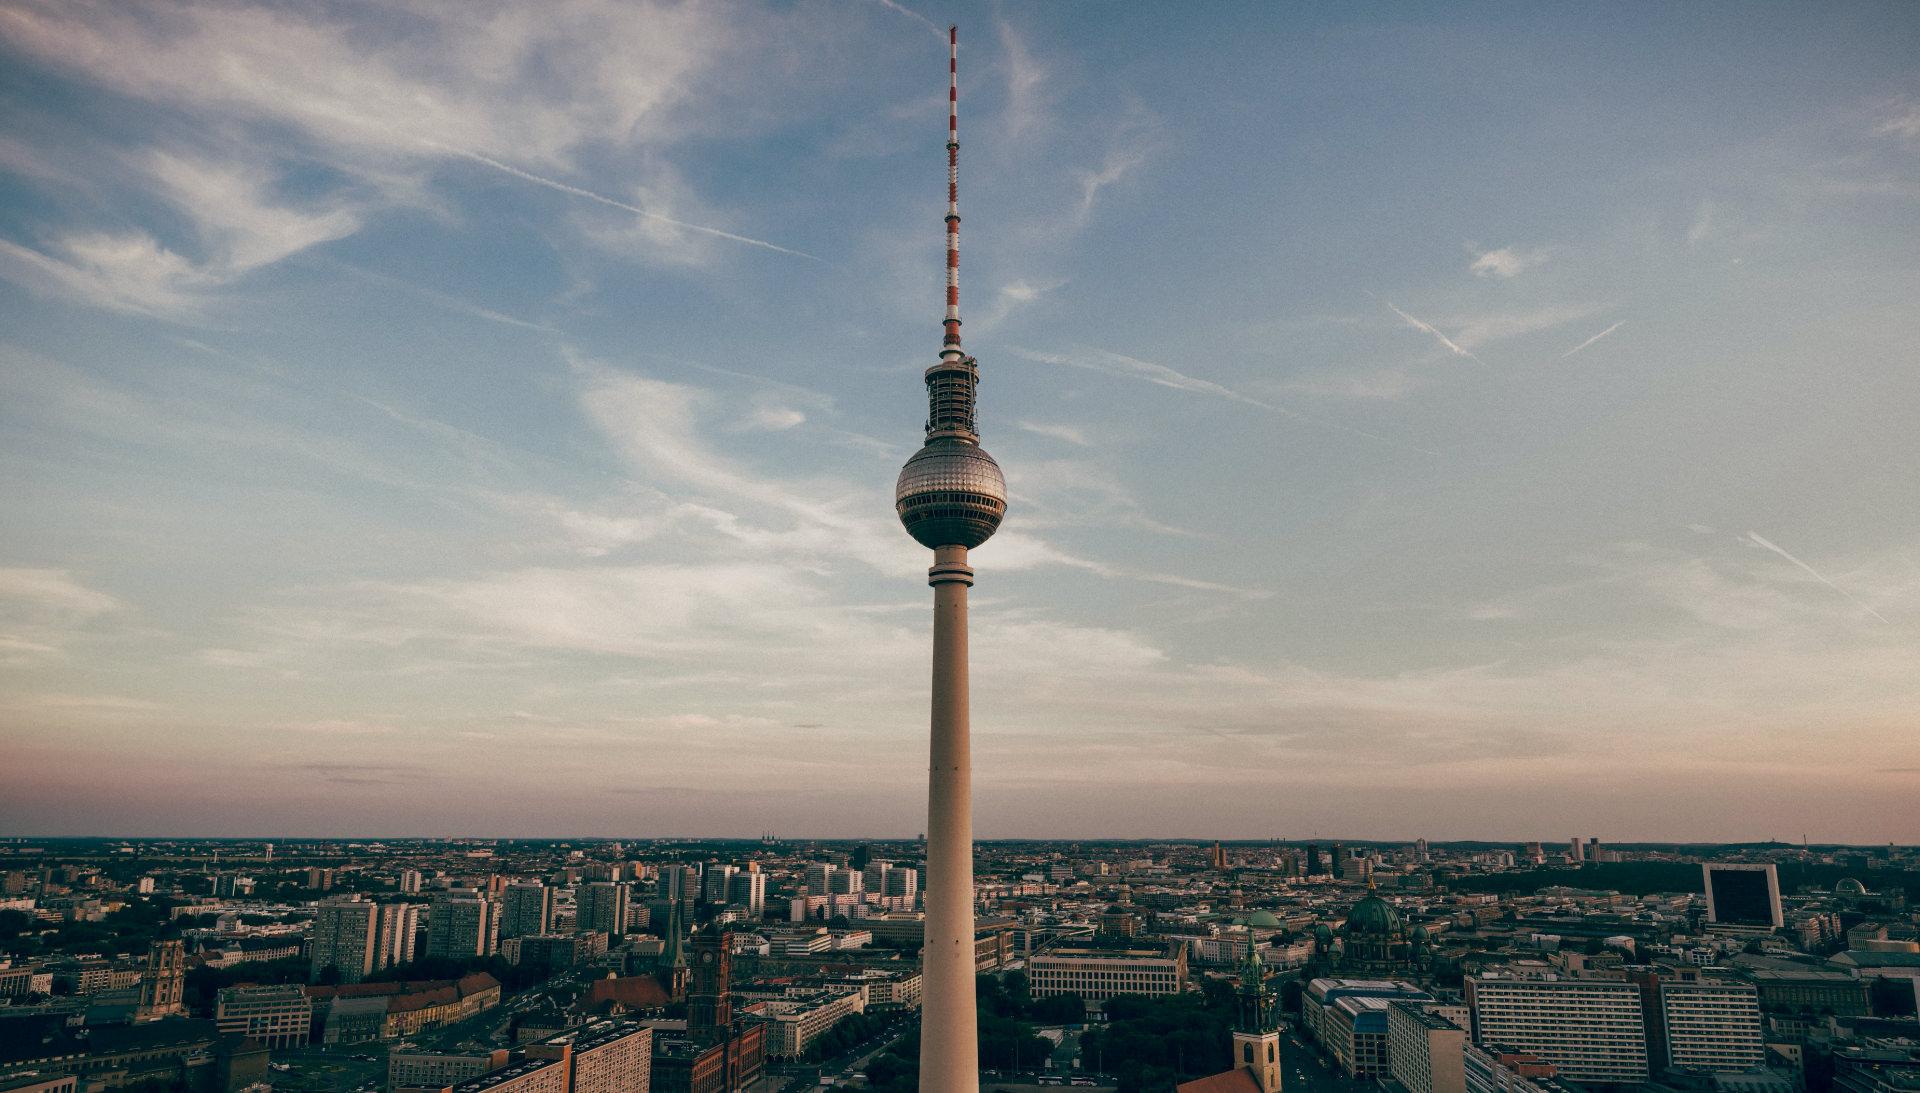 Berlin jobs TV Tower